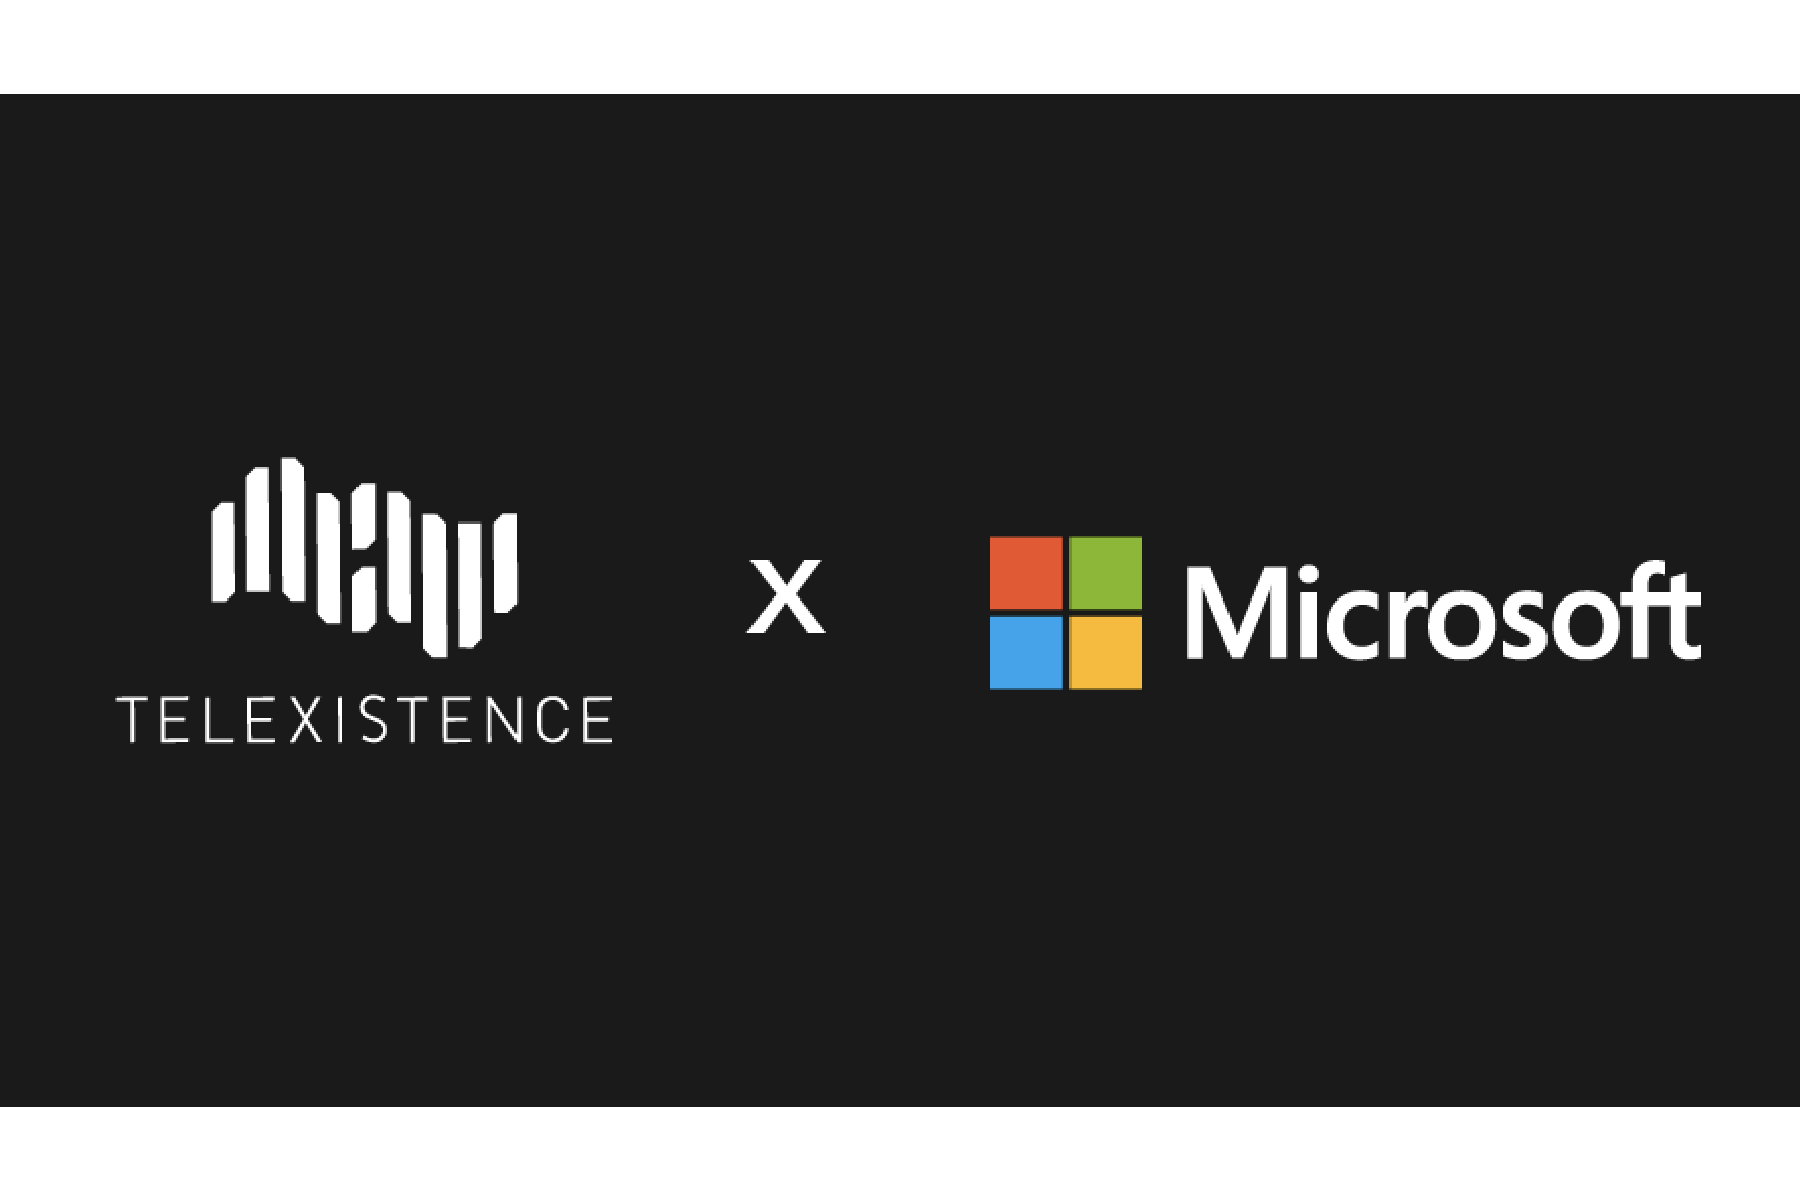 Telexistence×日本マイクロソフト  | 小売業界向けクラウドロボティクスサービスの提供に向け協業